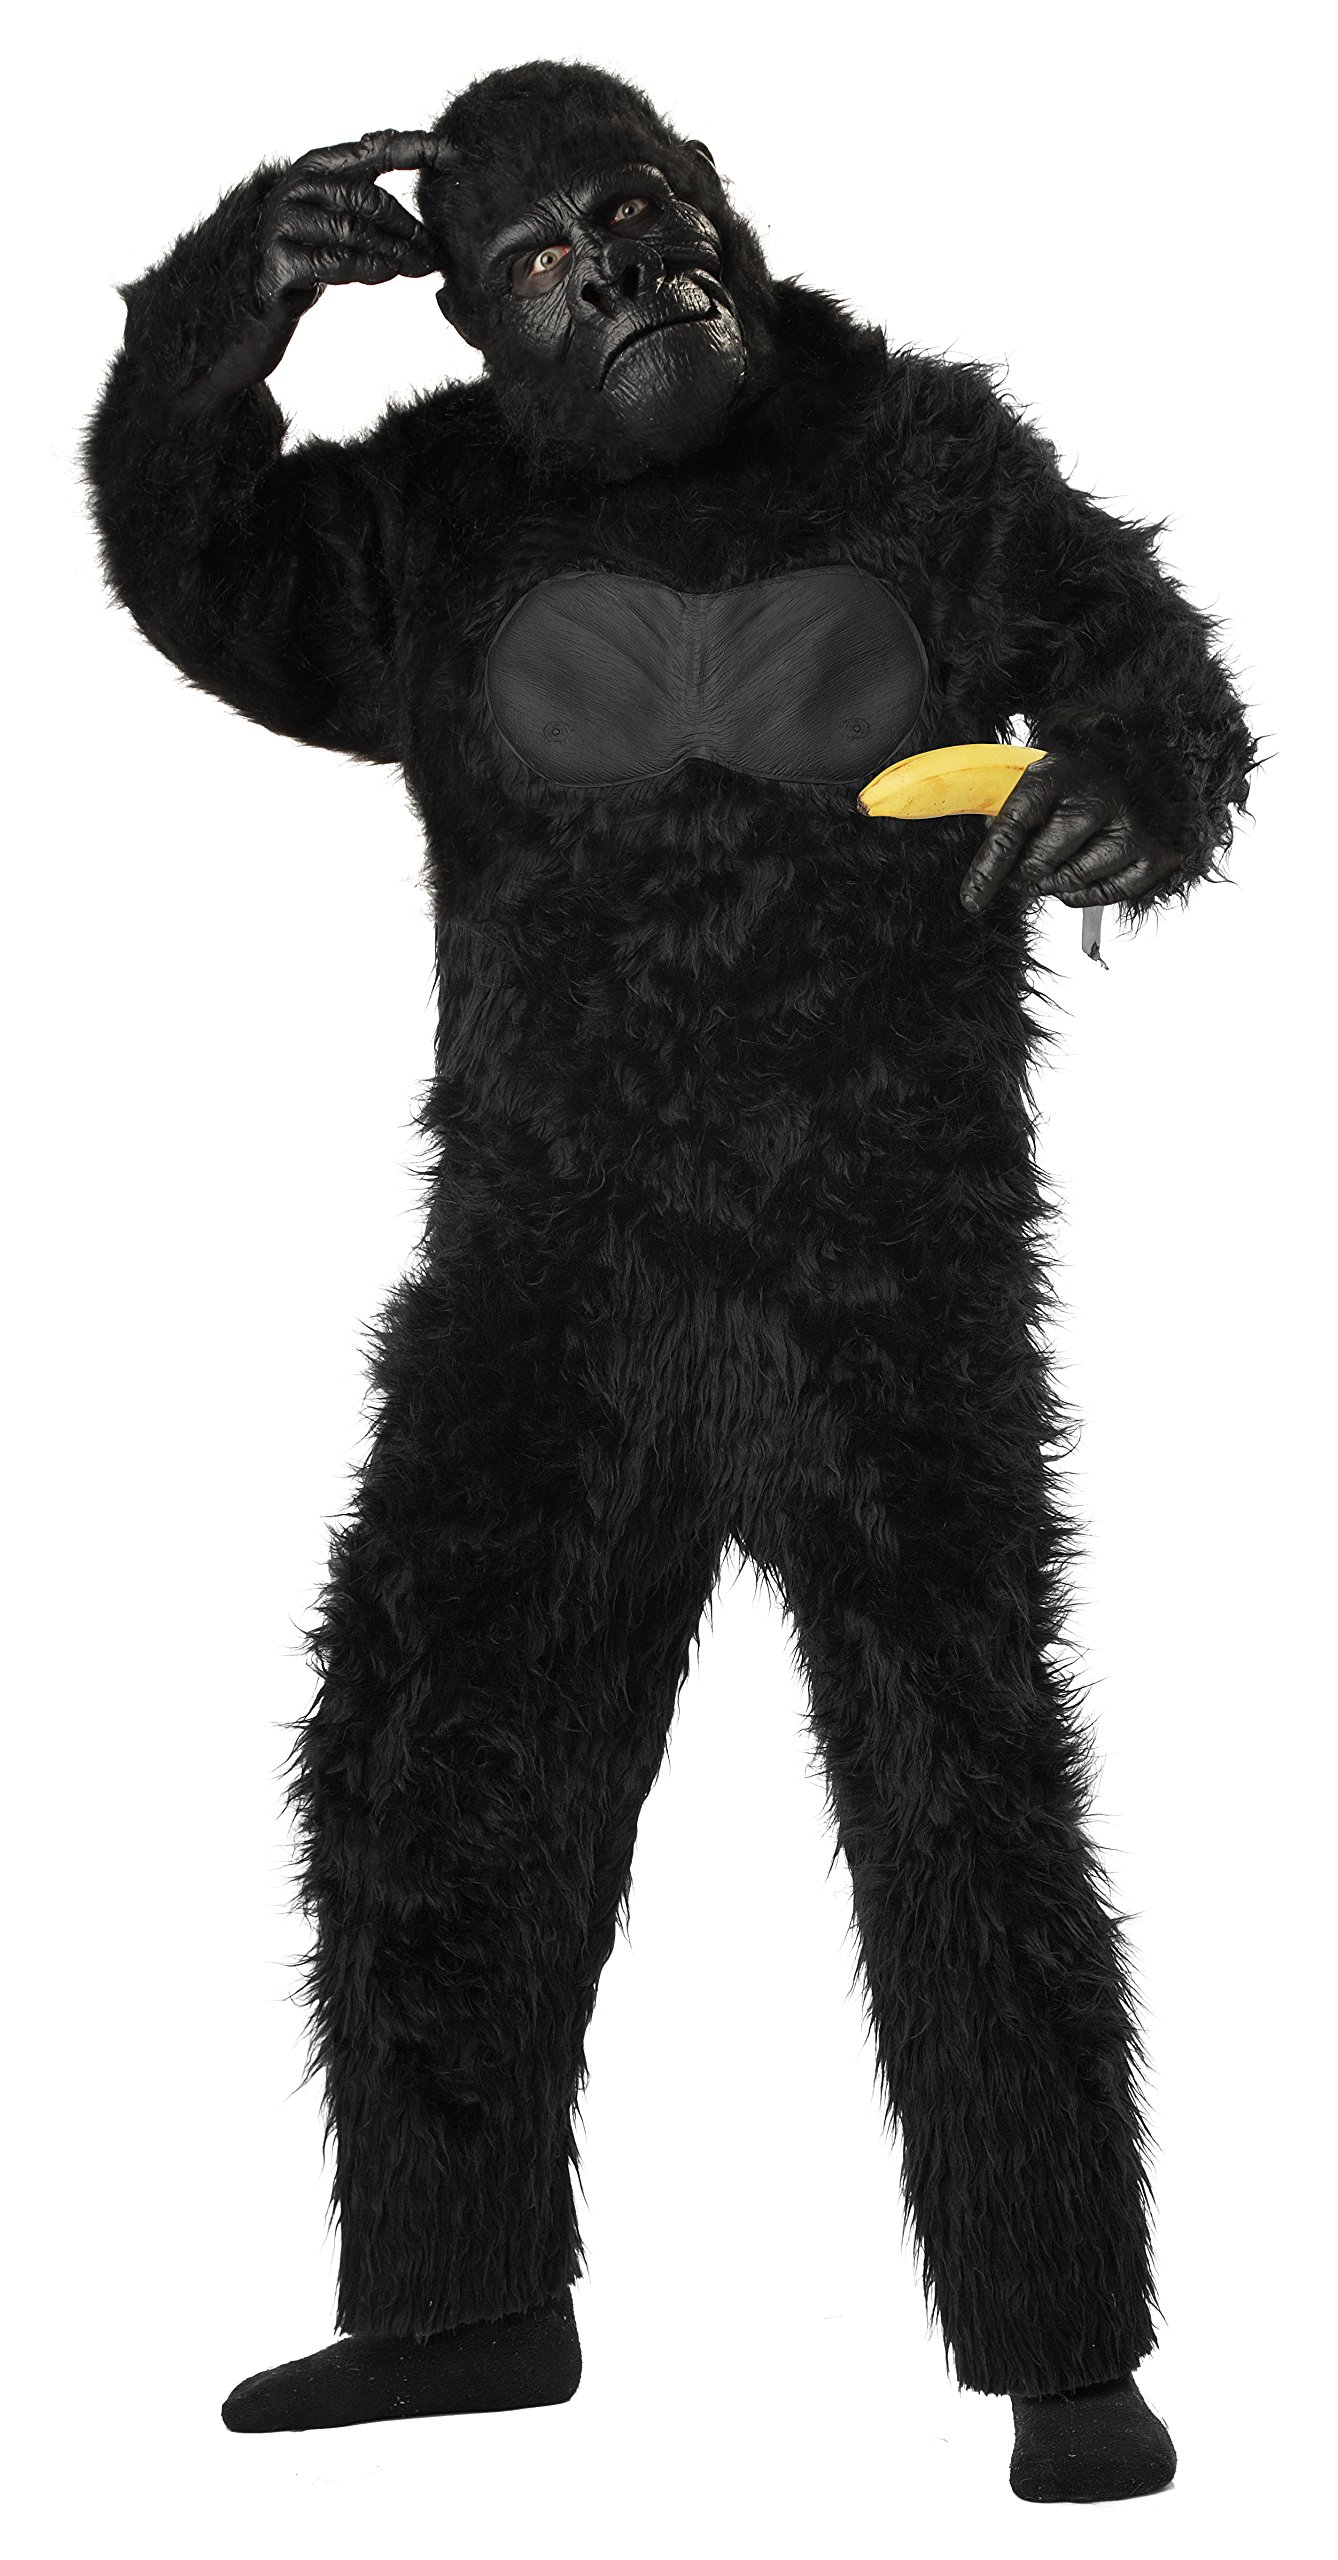 California Costumes Gorilla Child Costume, Large by California Costumes